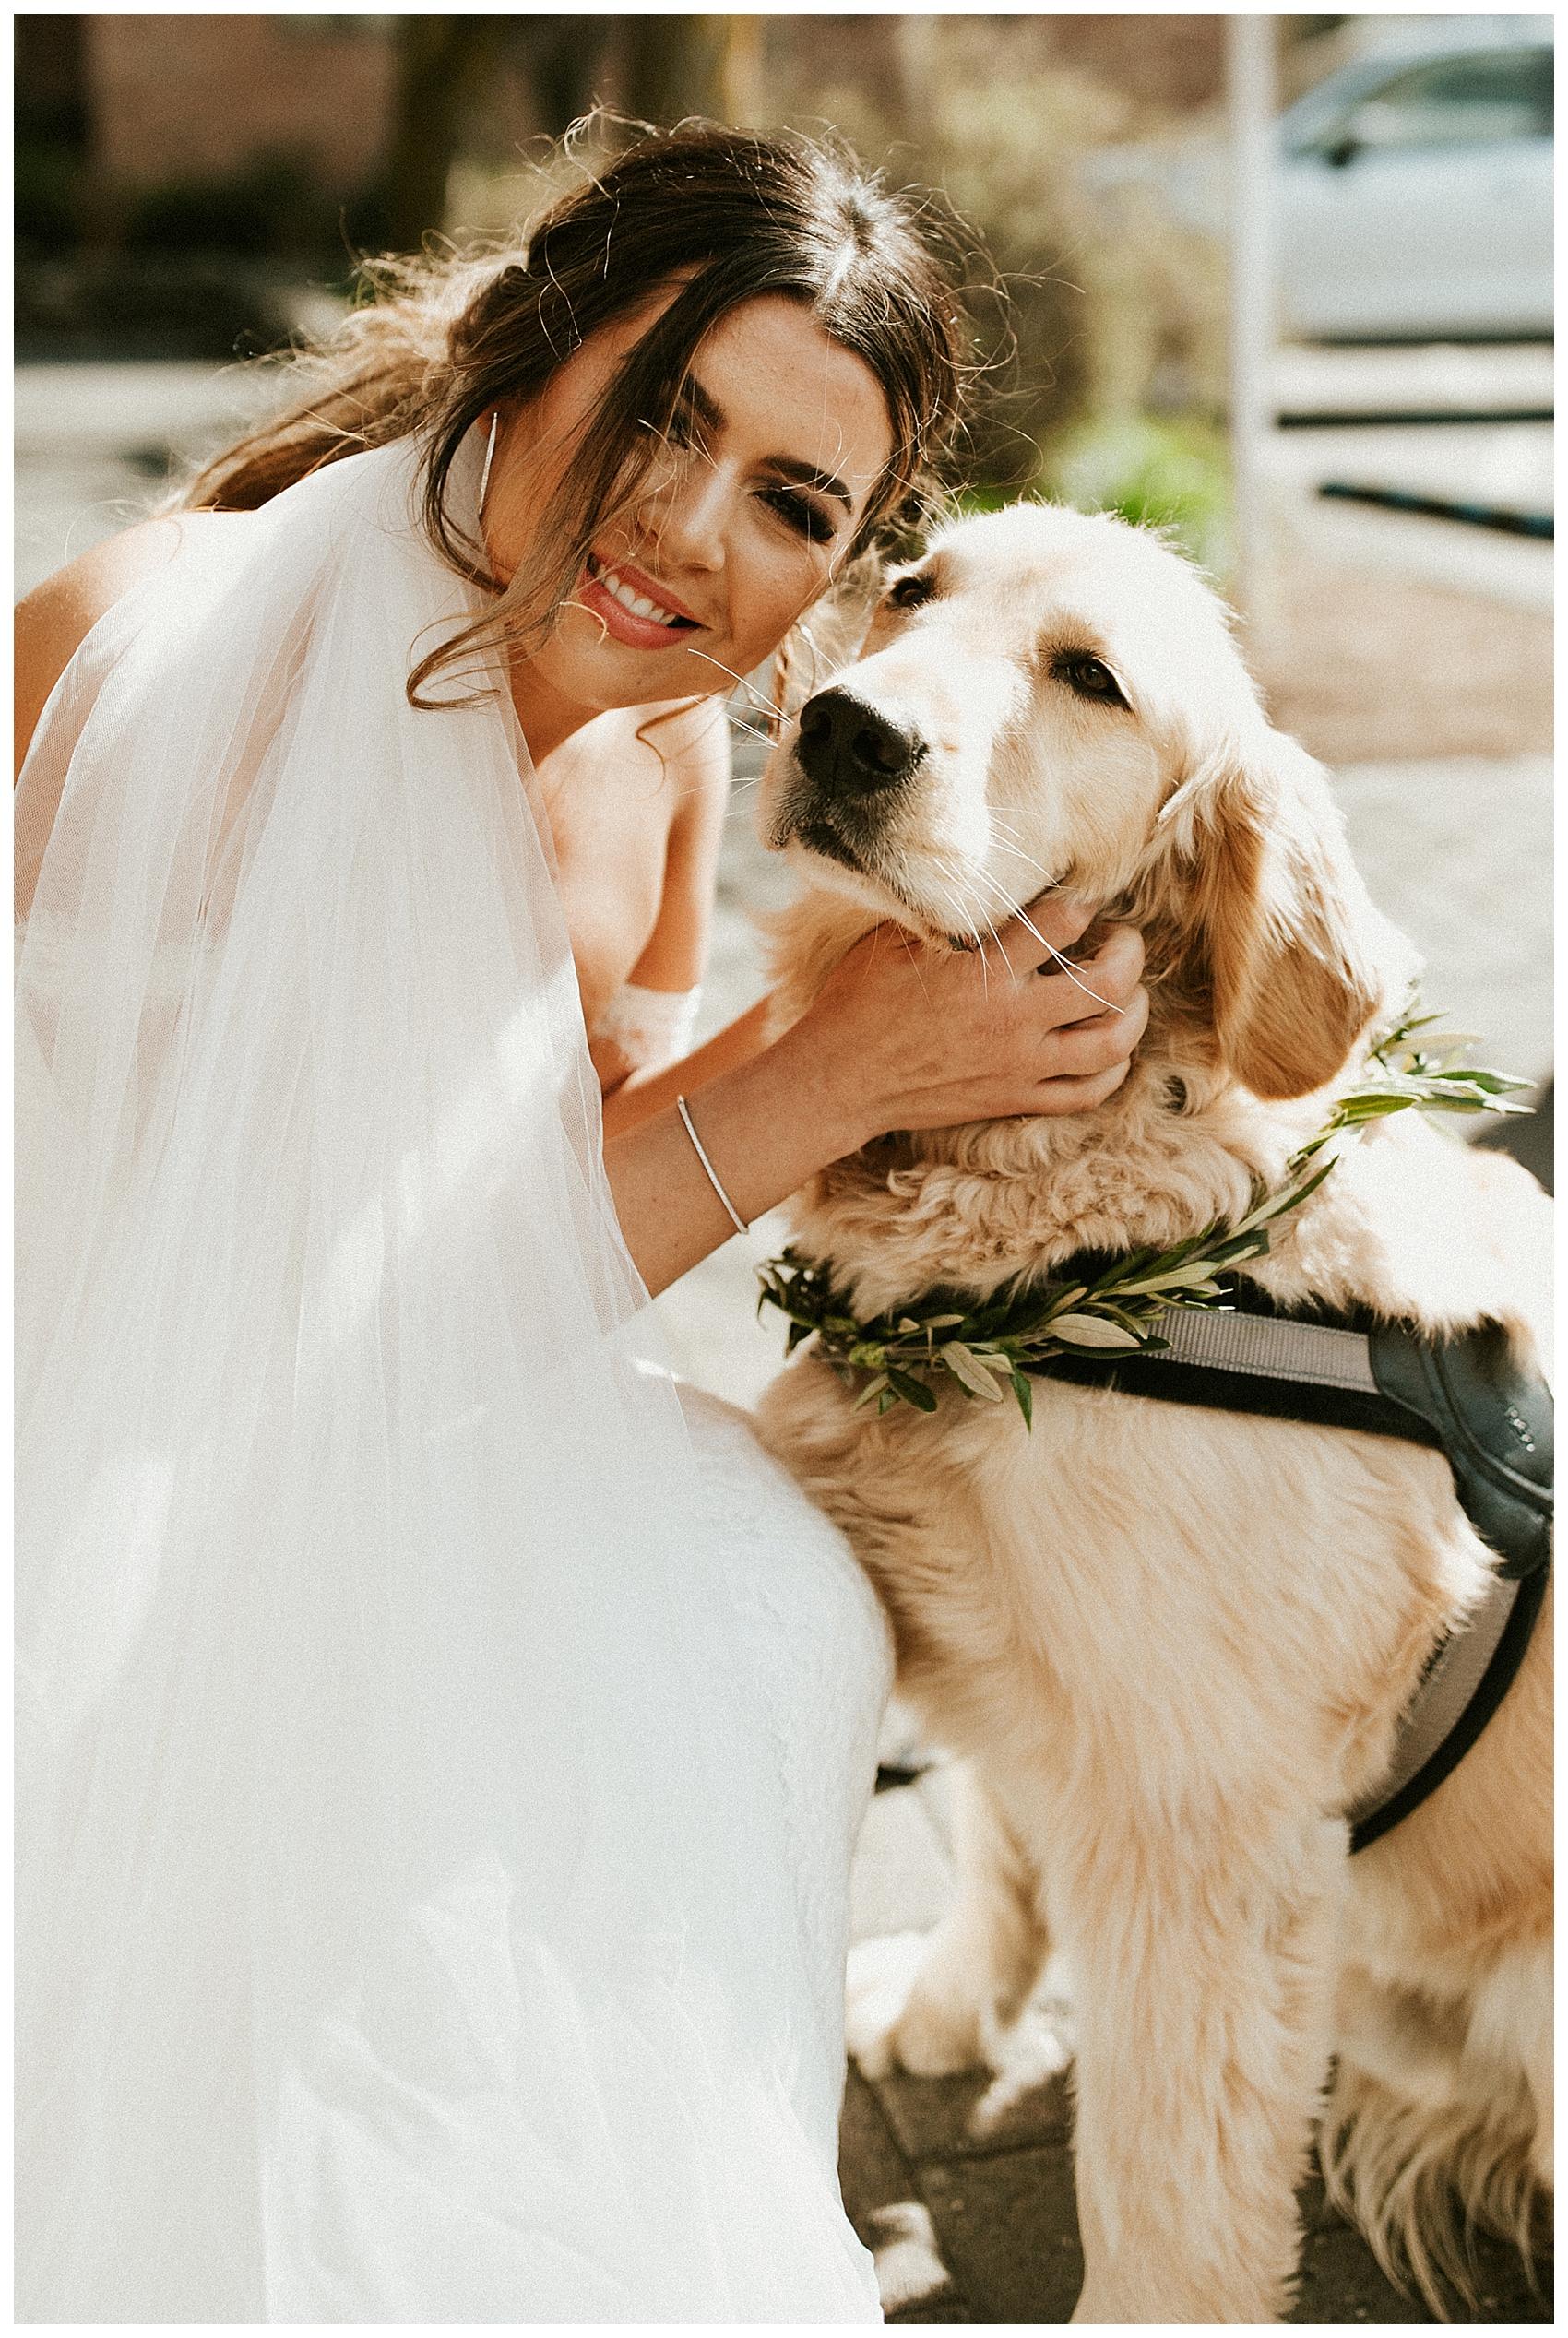 Chateau Rive Spokane Wedding Cassie Trottier Photography01039.jpg